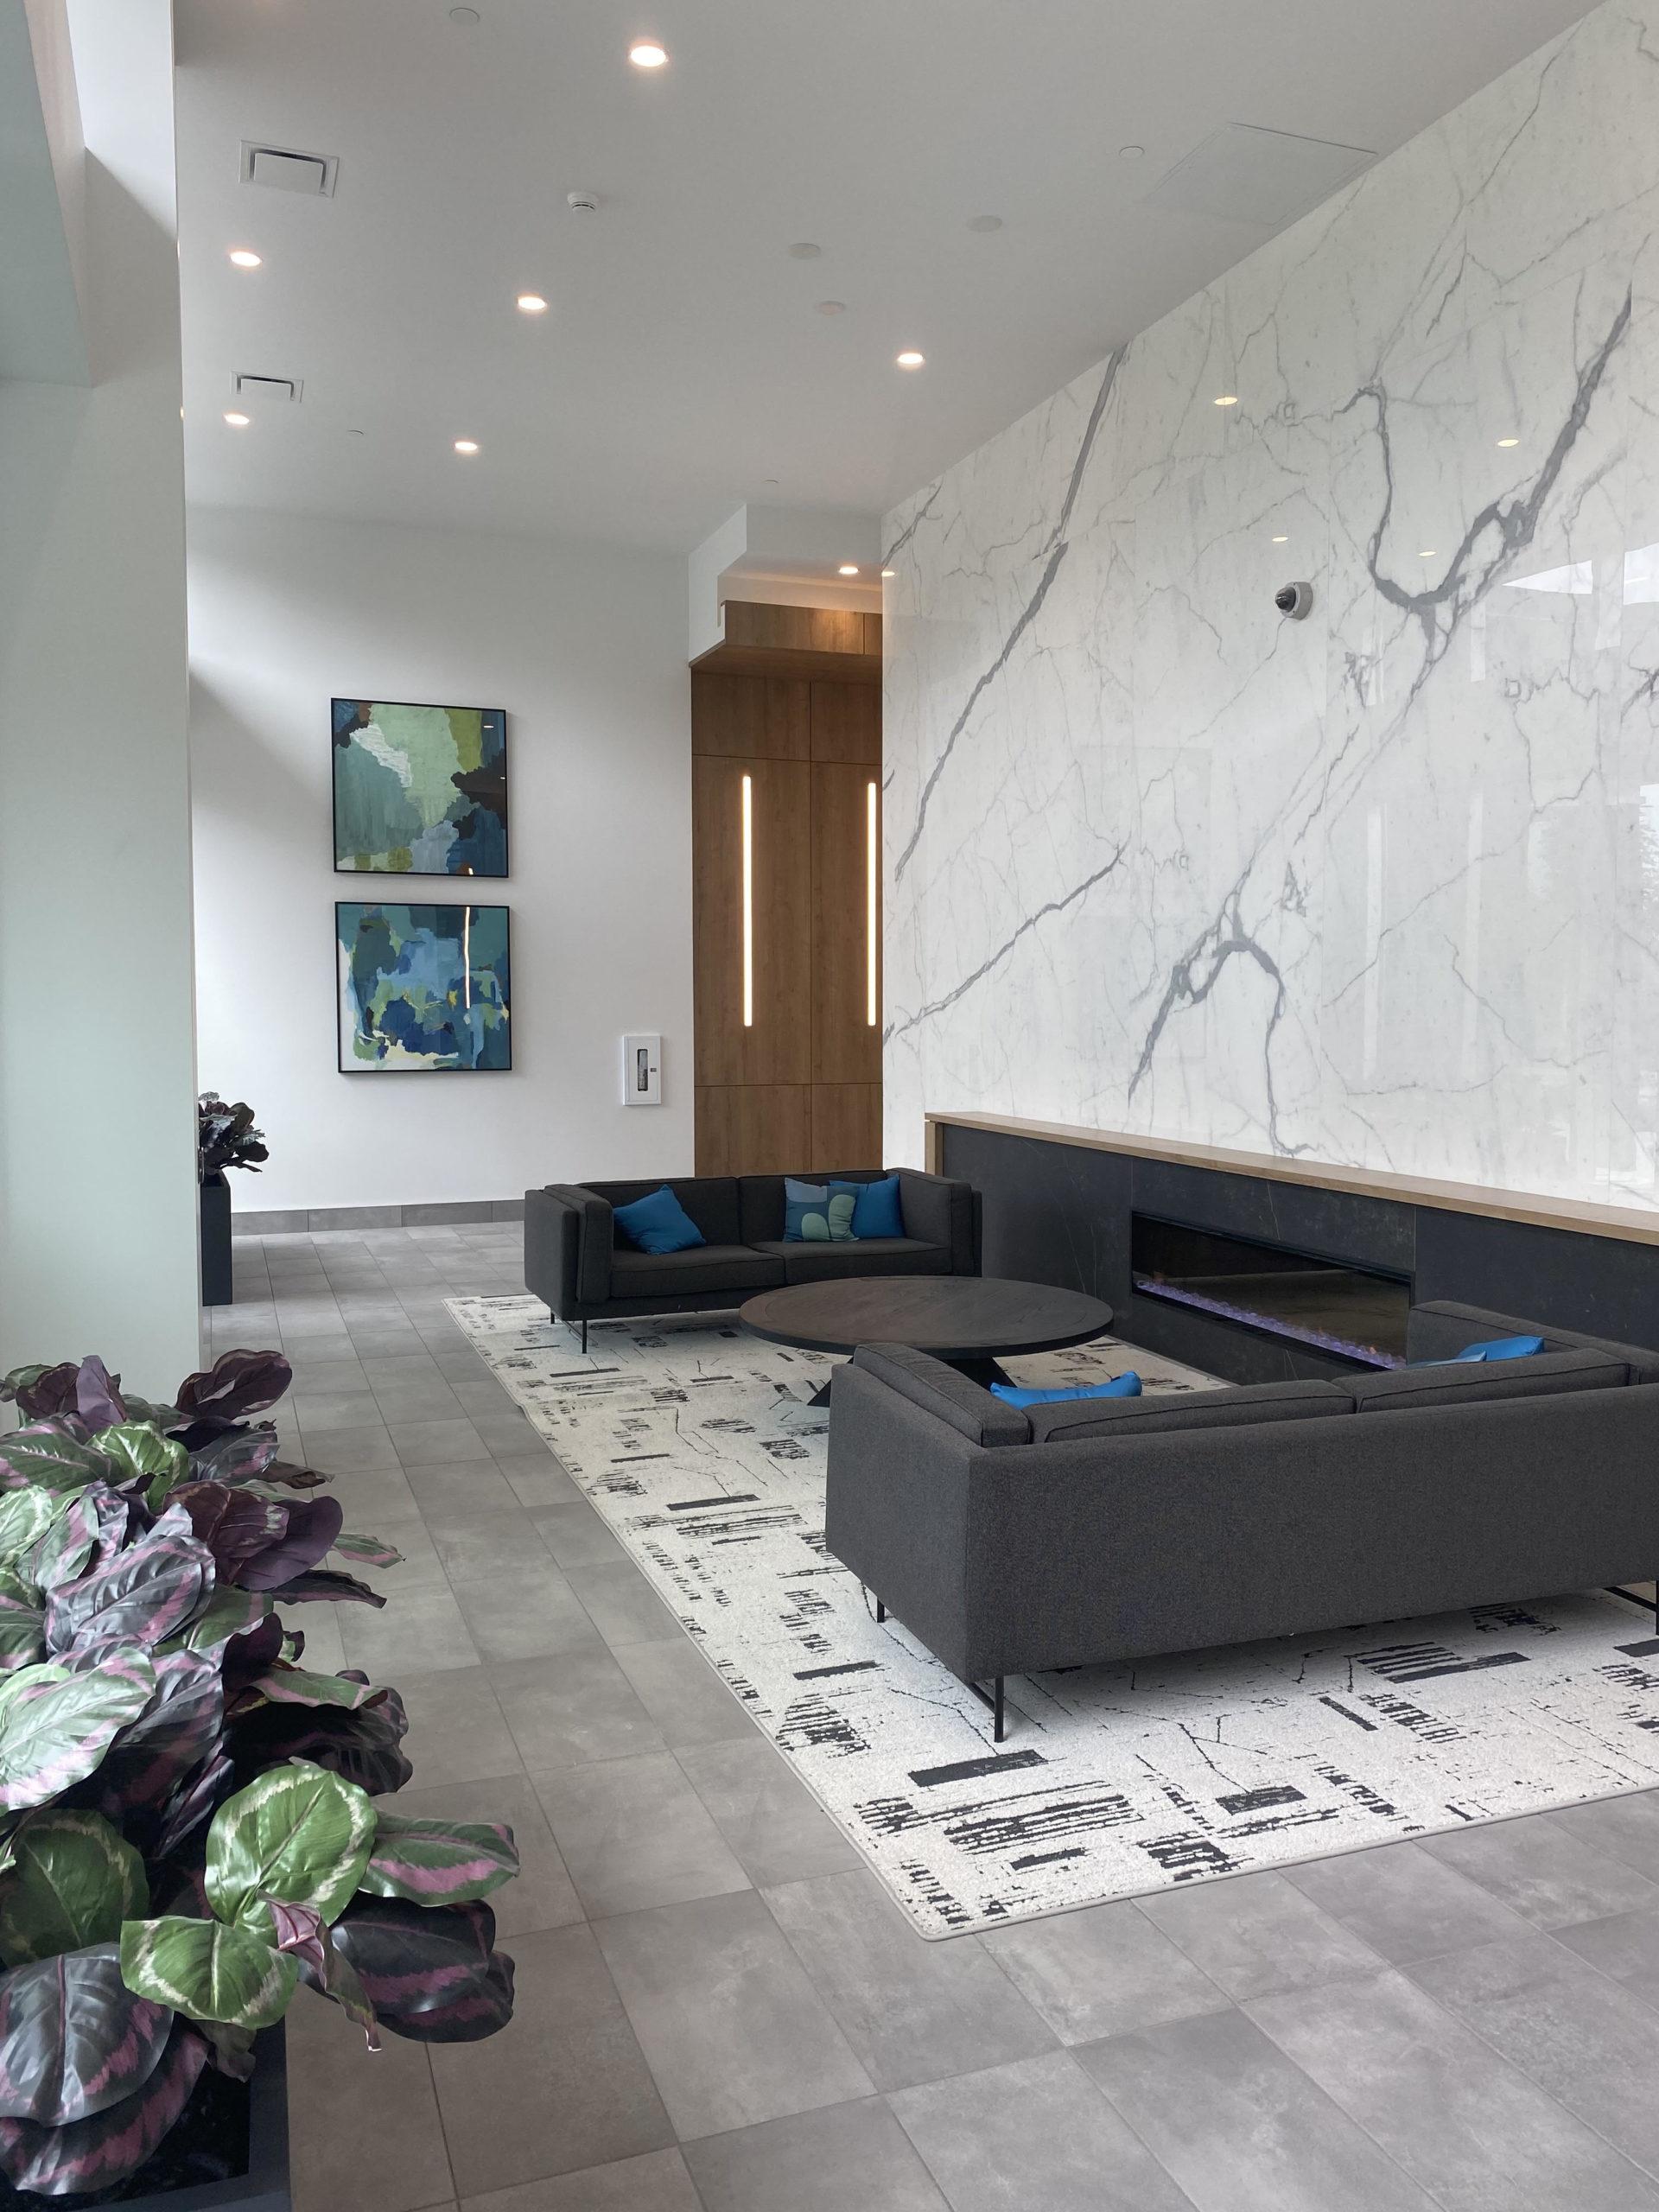 1 bed/1 bath 19th floor condo – The Hub at King George